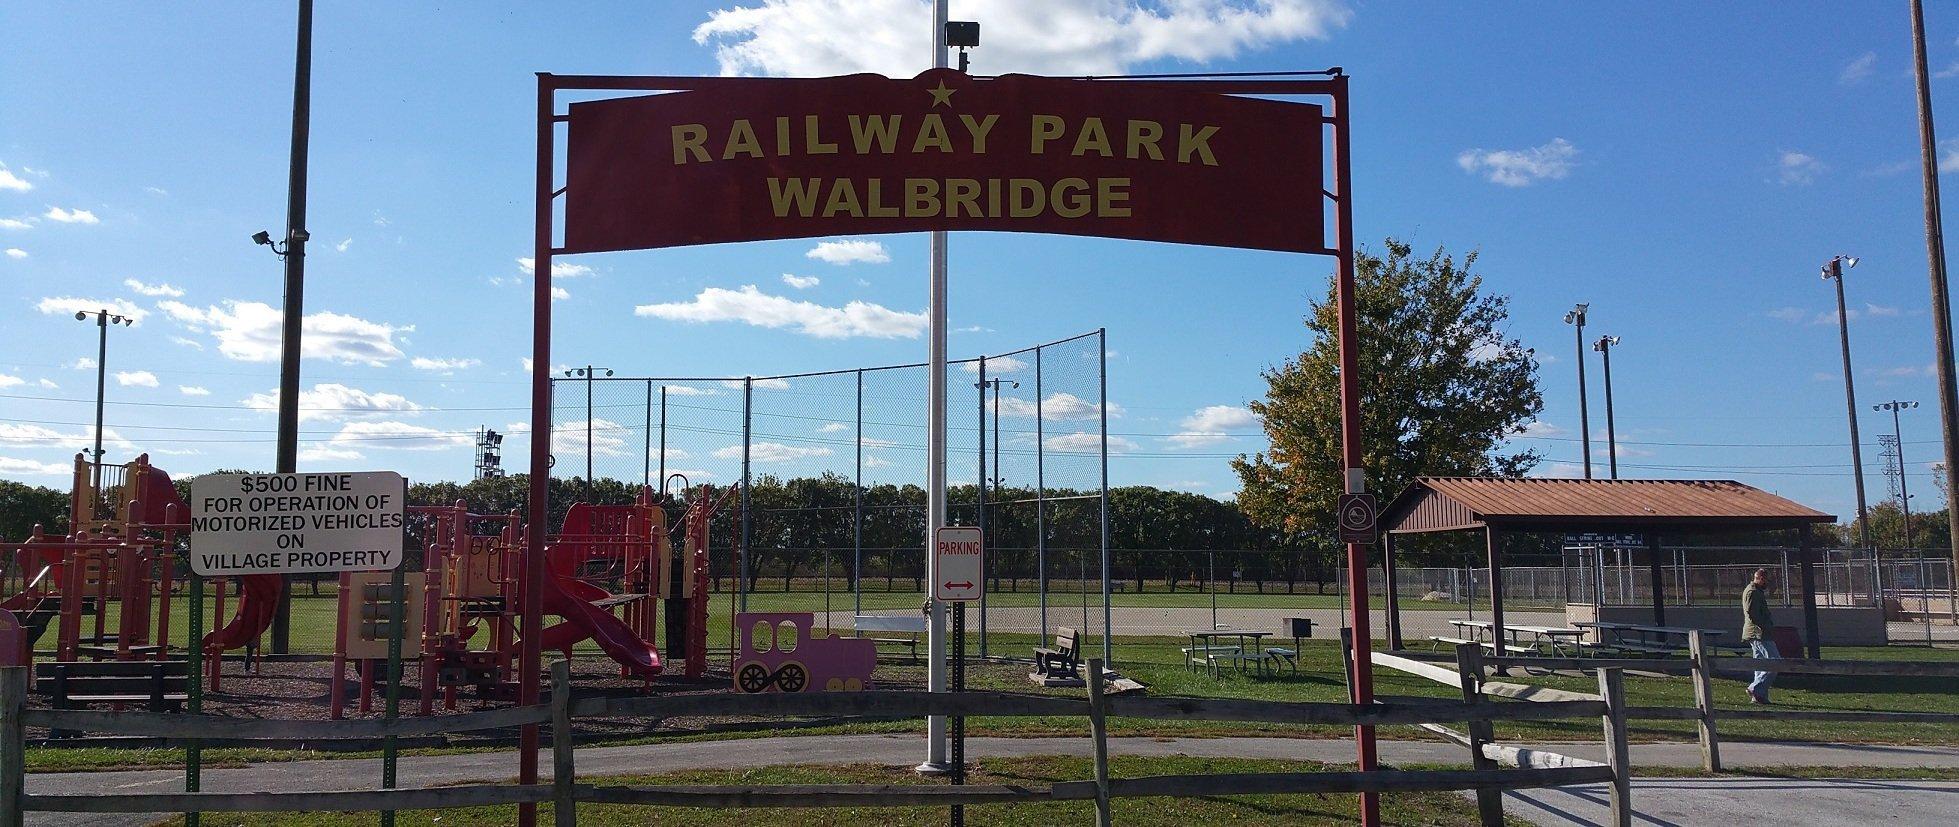 Railway Park Walbridge Ohio